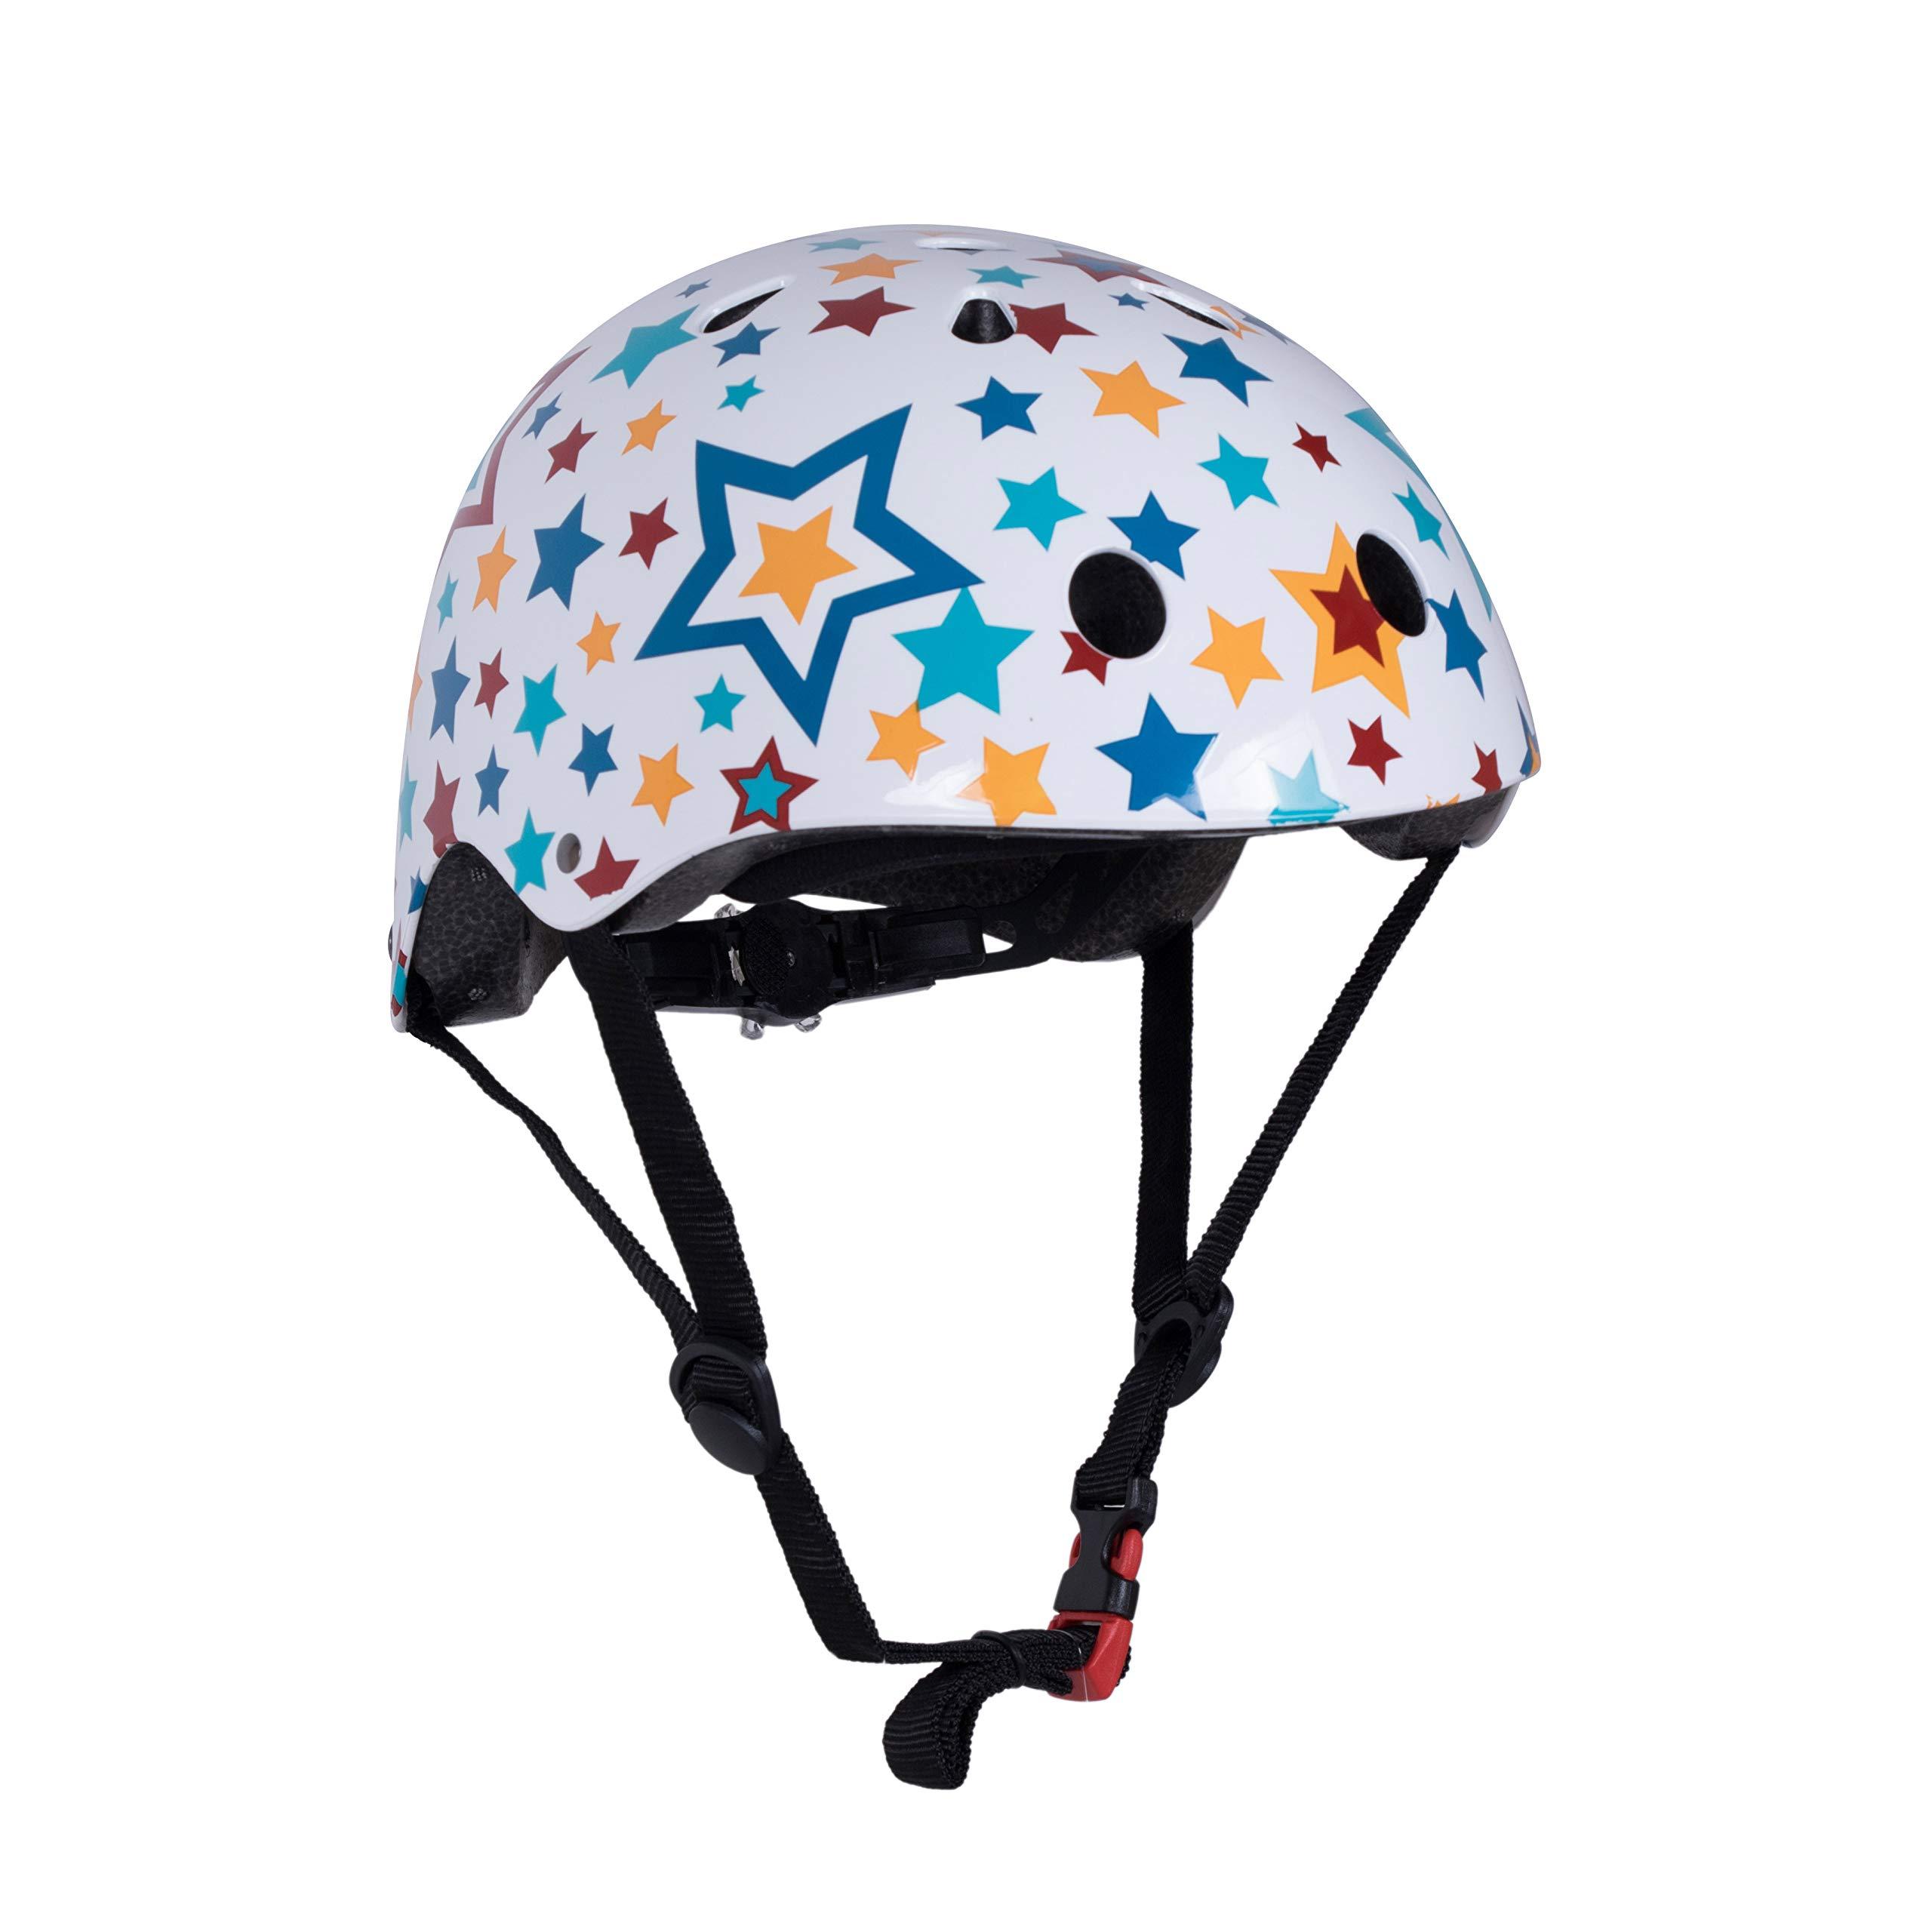 Kiddimoto Kids Patterned Helmet (Starz, Small)